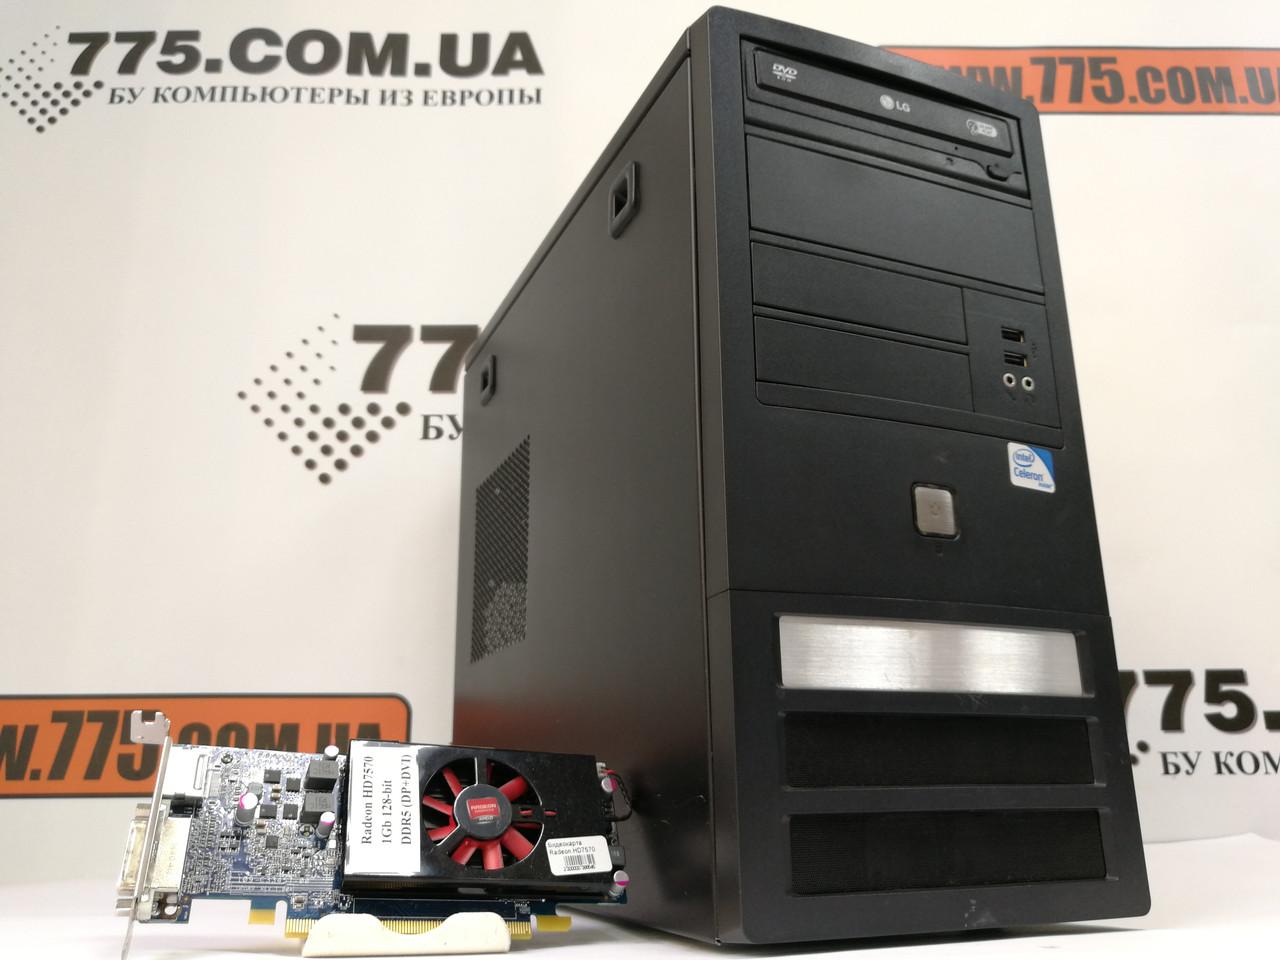 Игровой компьютер, Intel Core2Quad Q9505  2.83GHz (4 ядра), RAM 4ГБ, SSD 240ГБ, Radeon HD7570 1GB DDR5